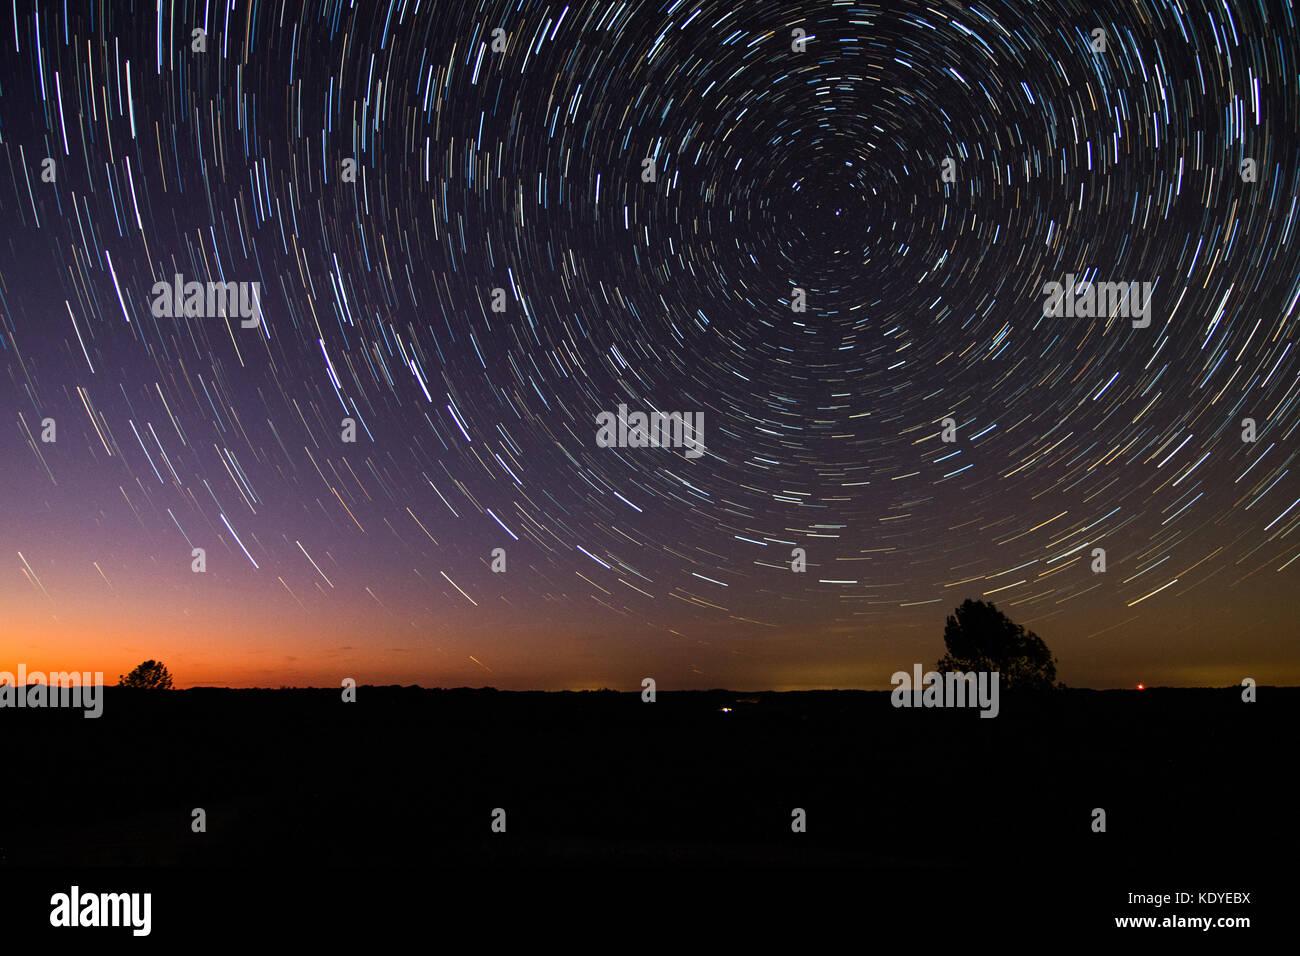 Star Trails der Rotation der Erde illustrieren. Stockbild